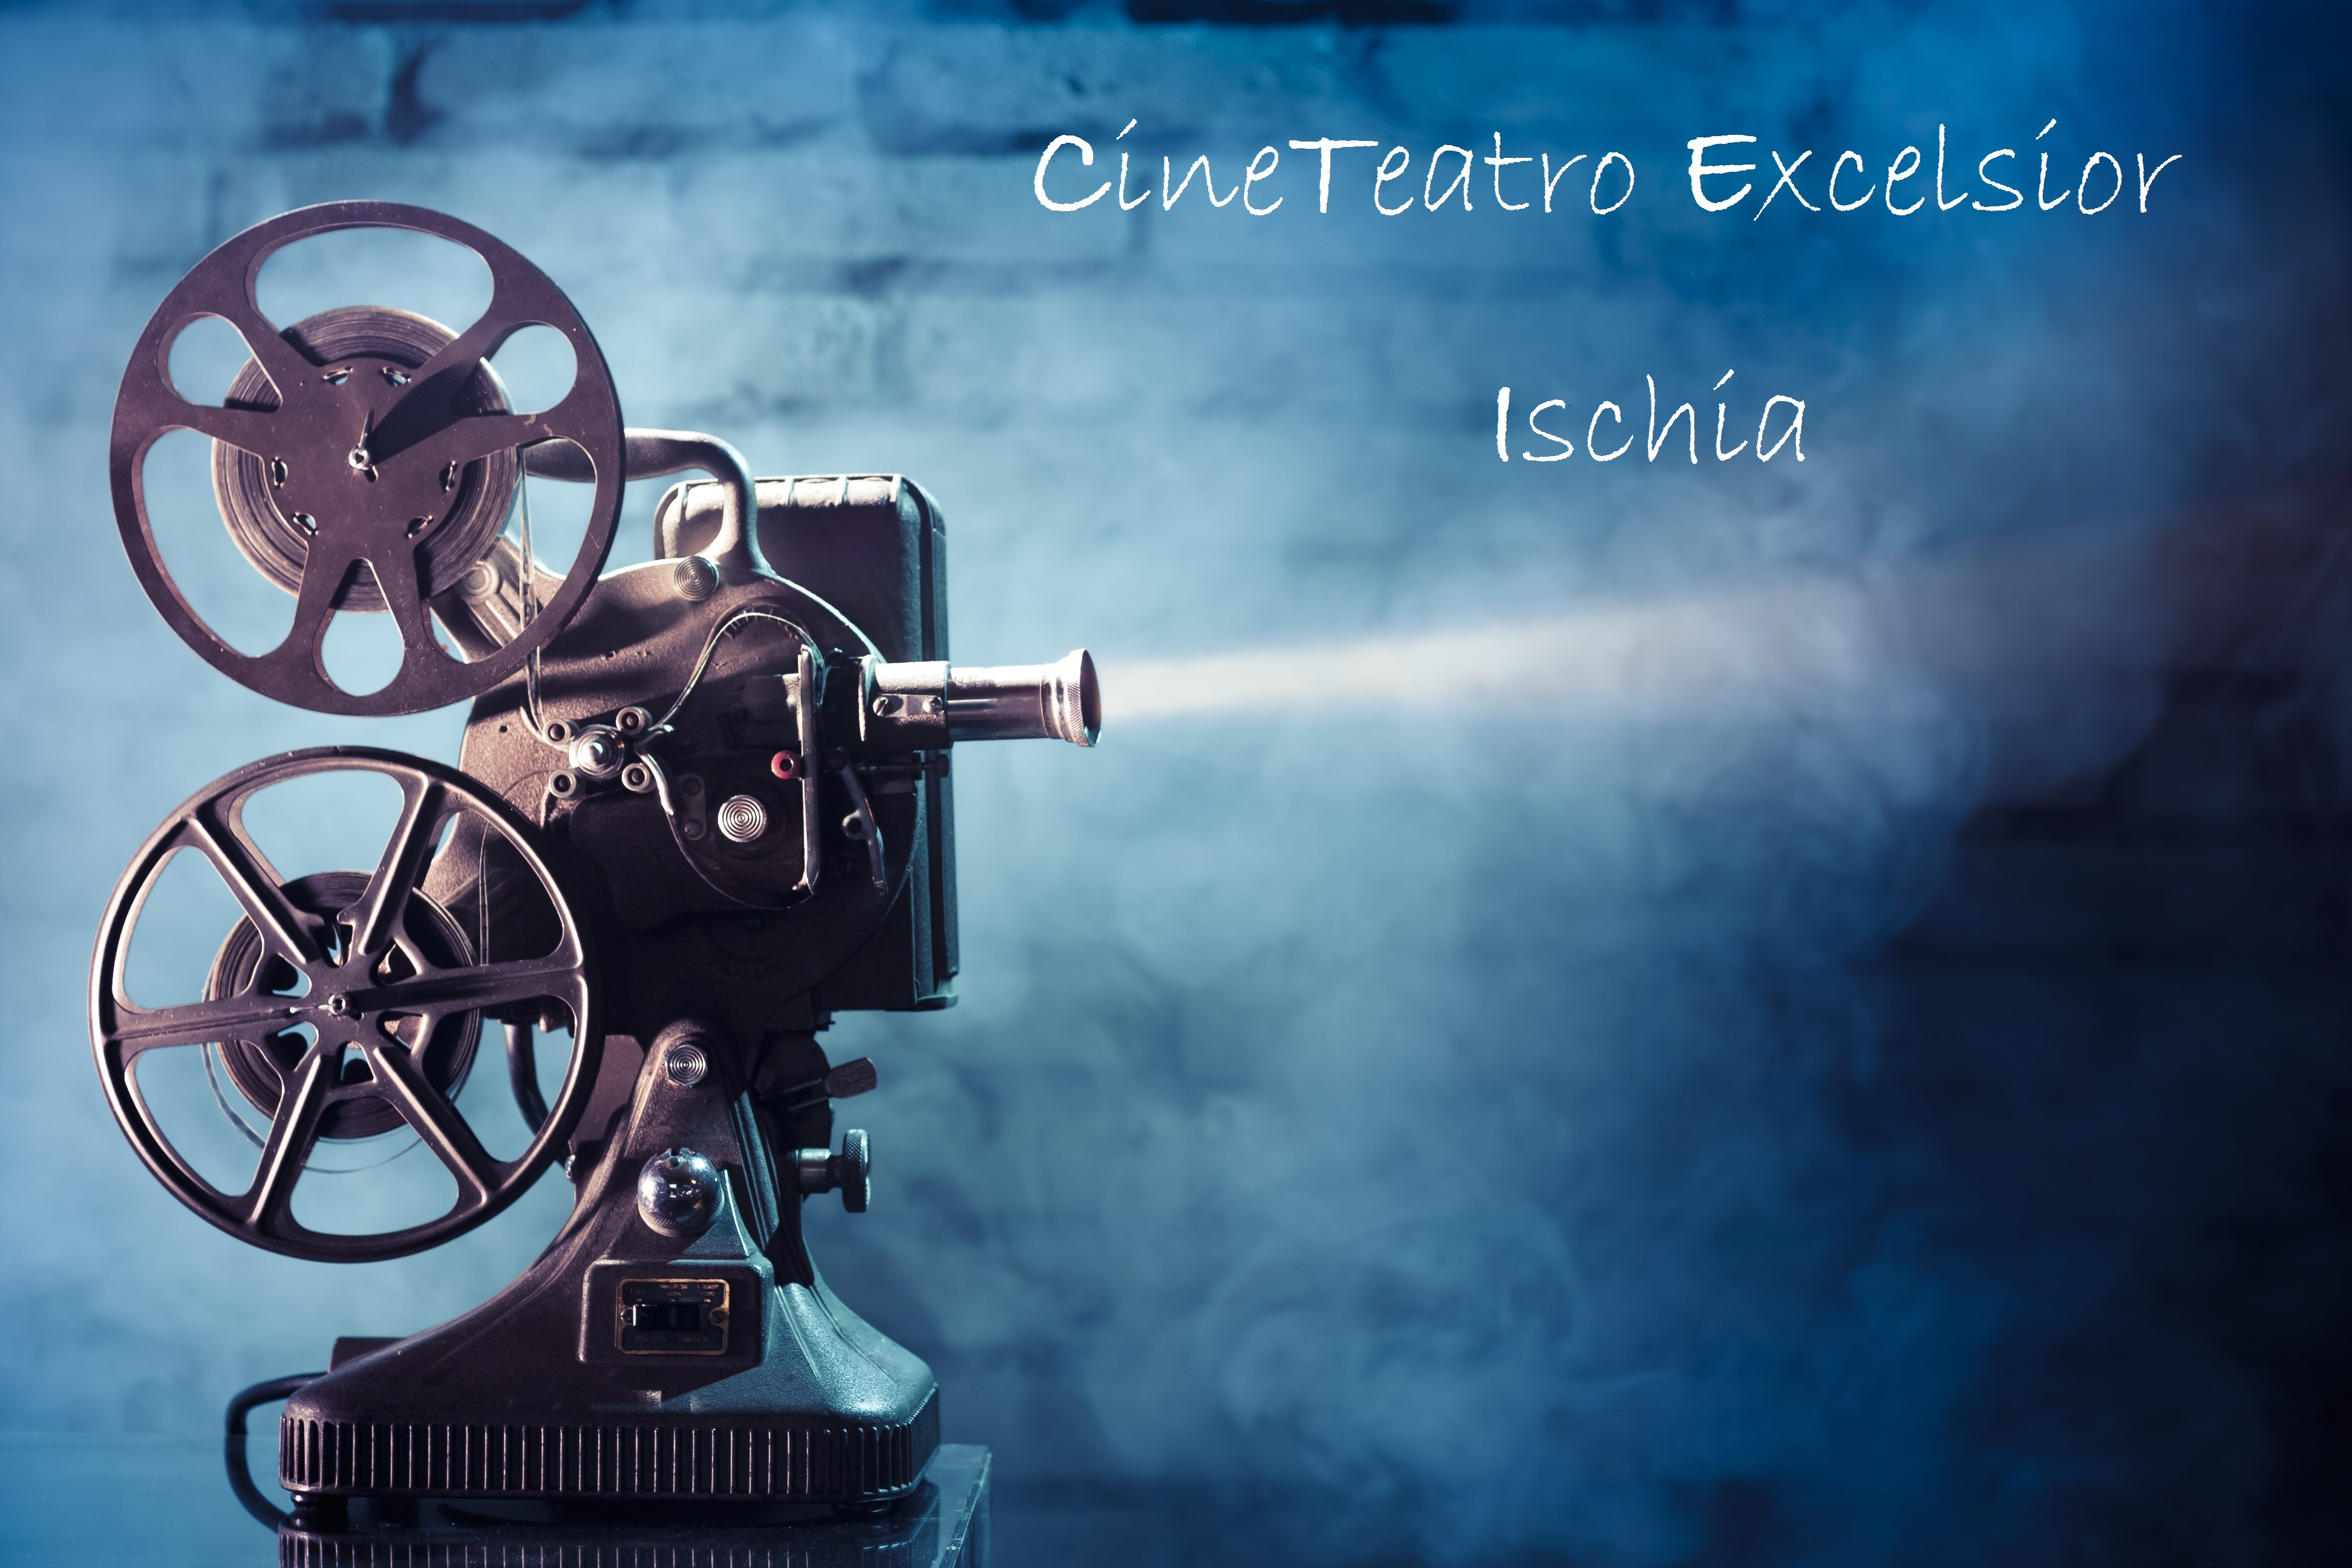 Cineteatro Excelsior